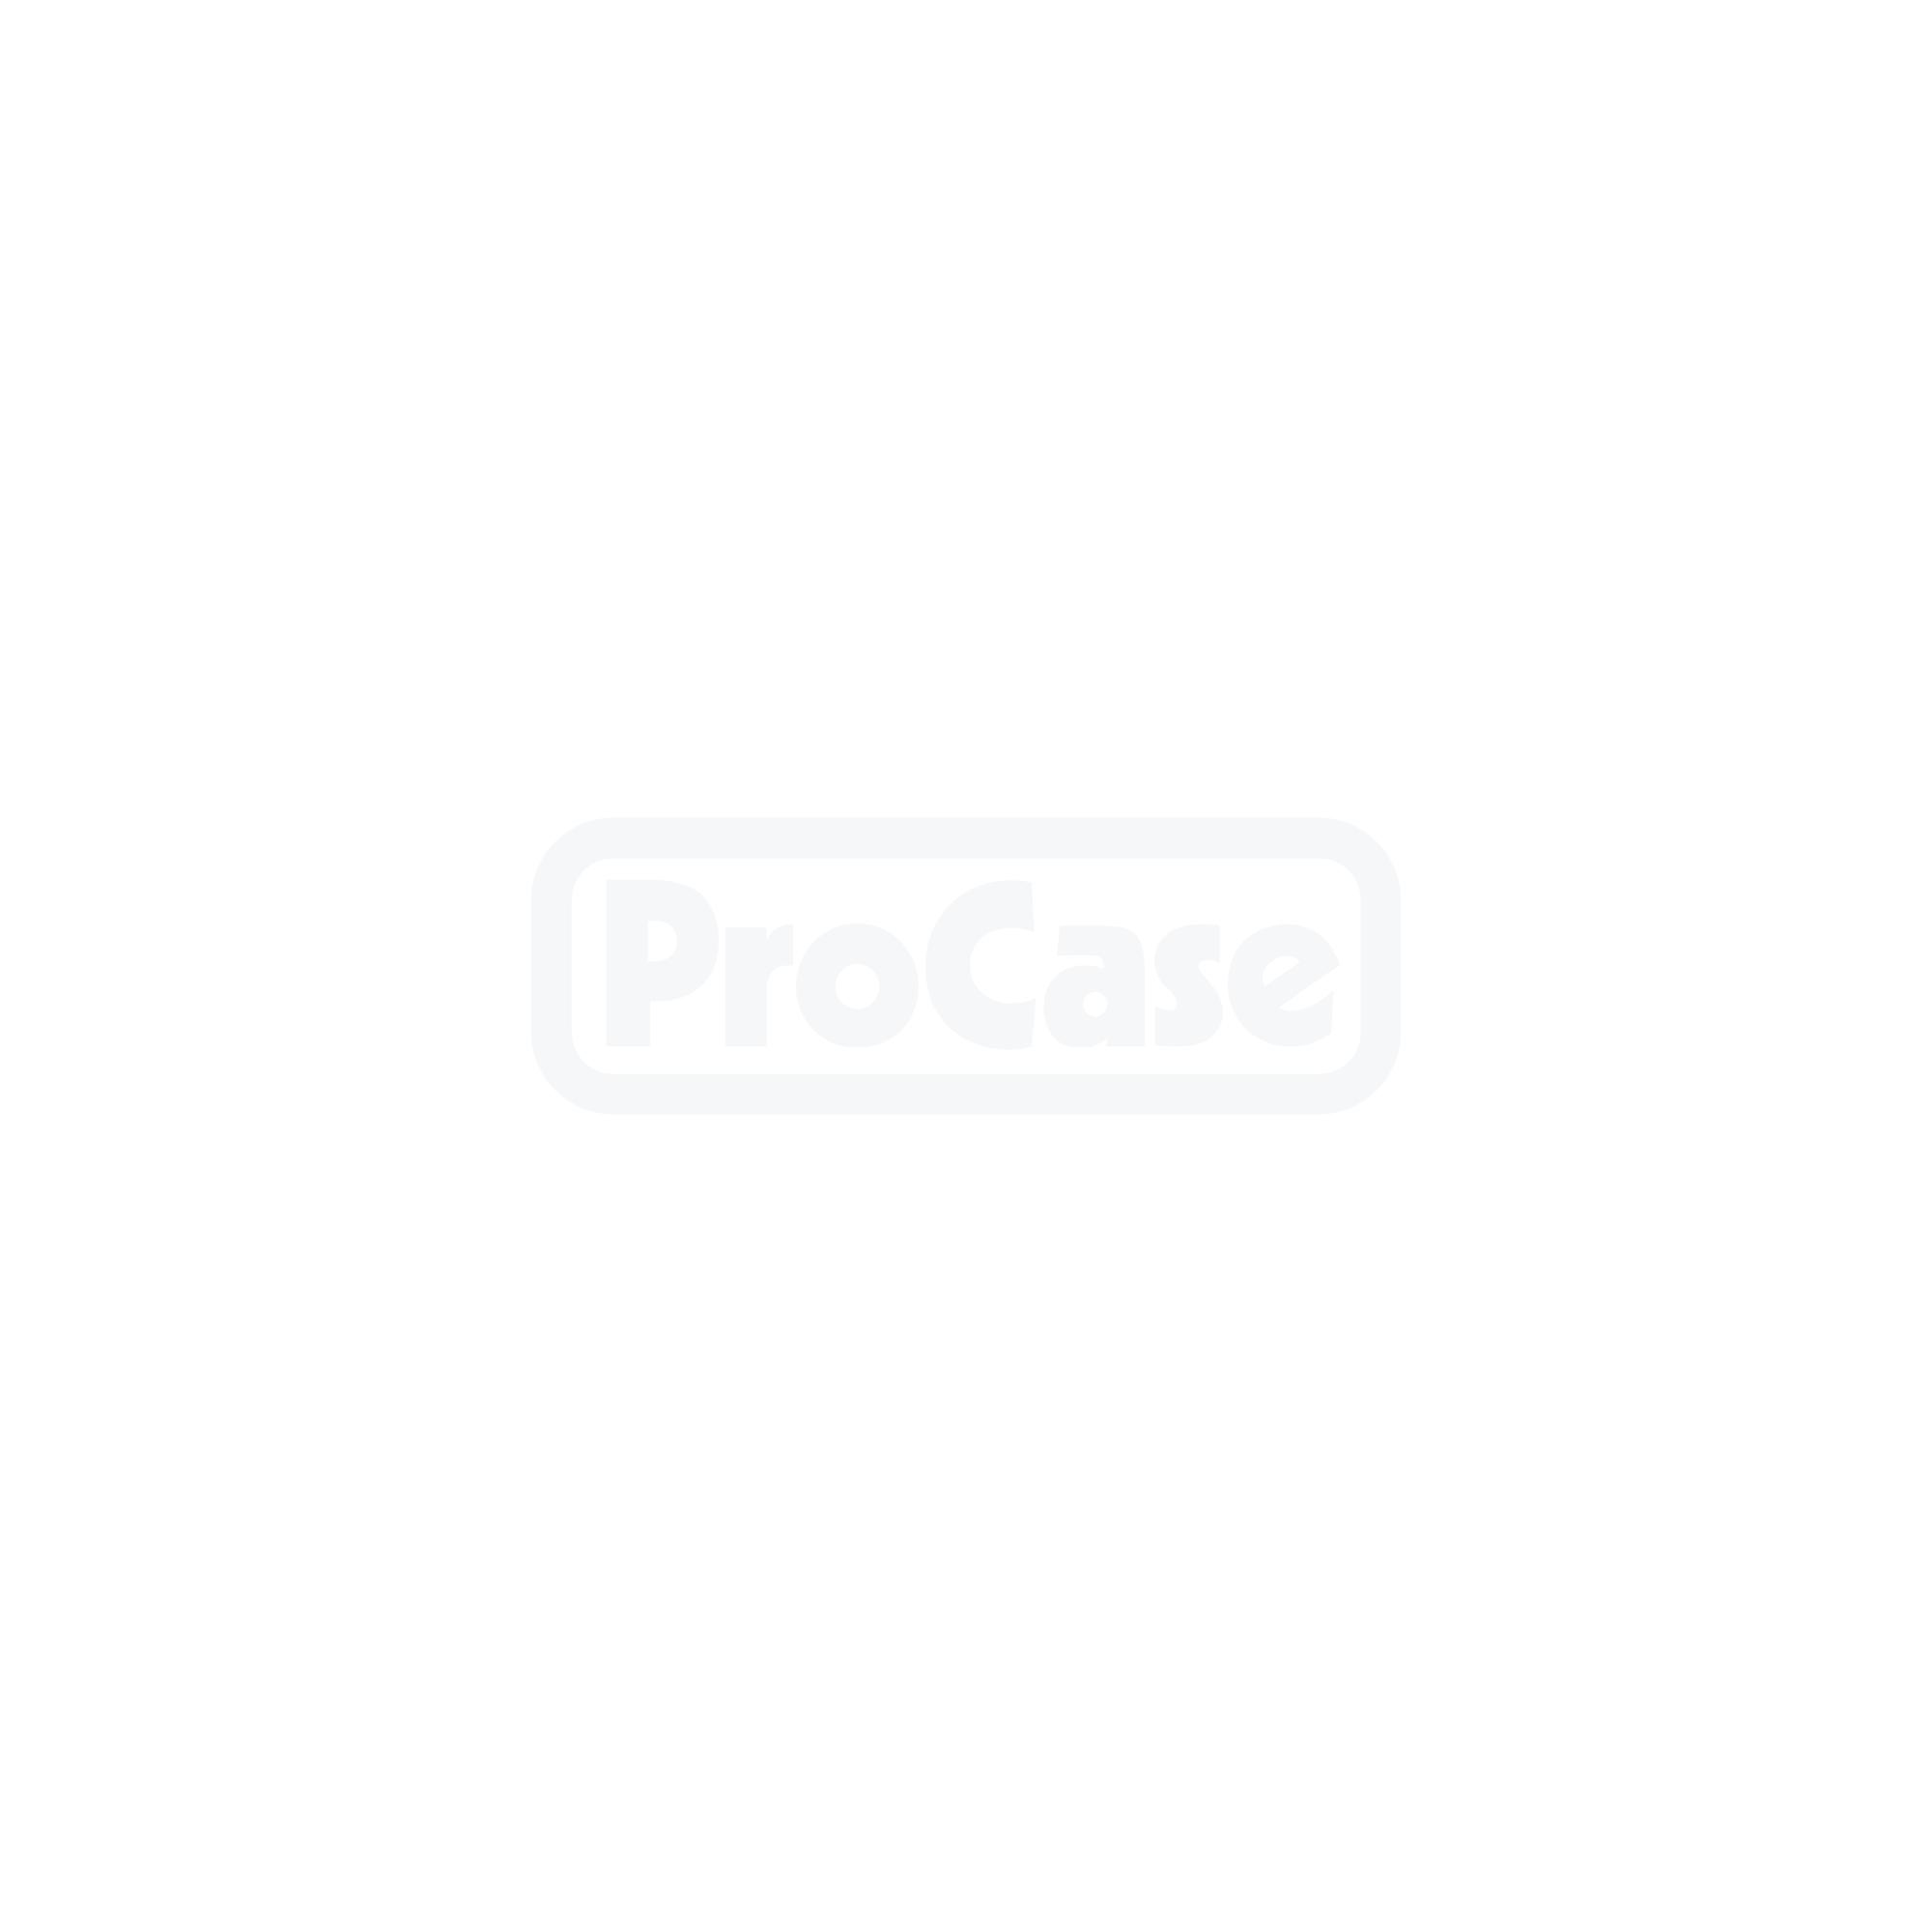 Flightcase für 4 JB Lighting P12 Profile